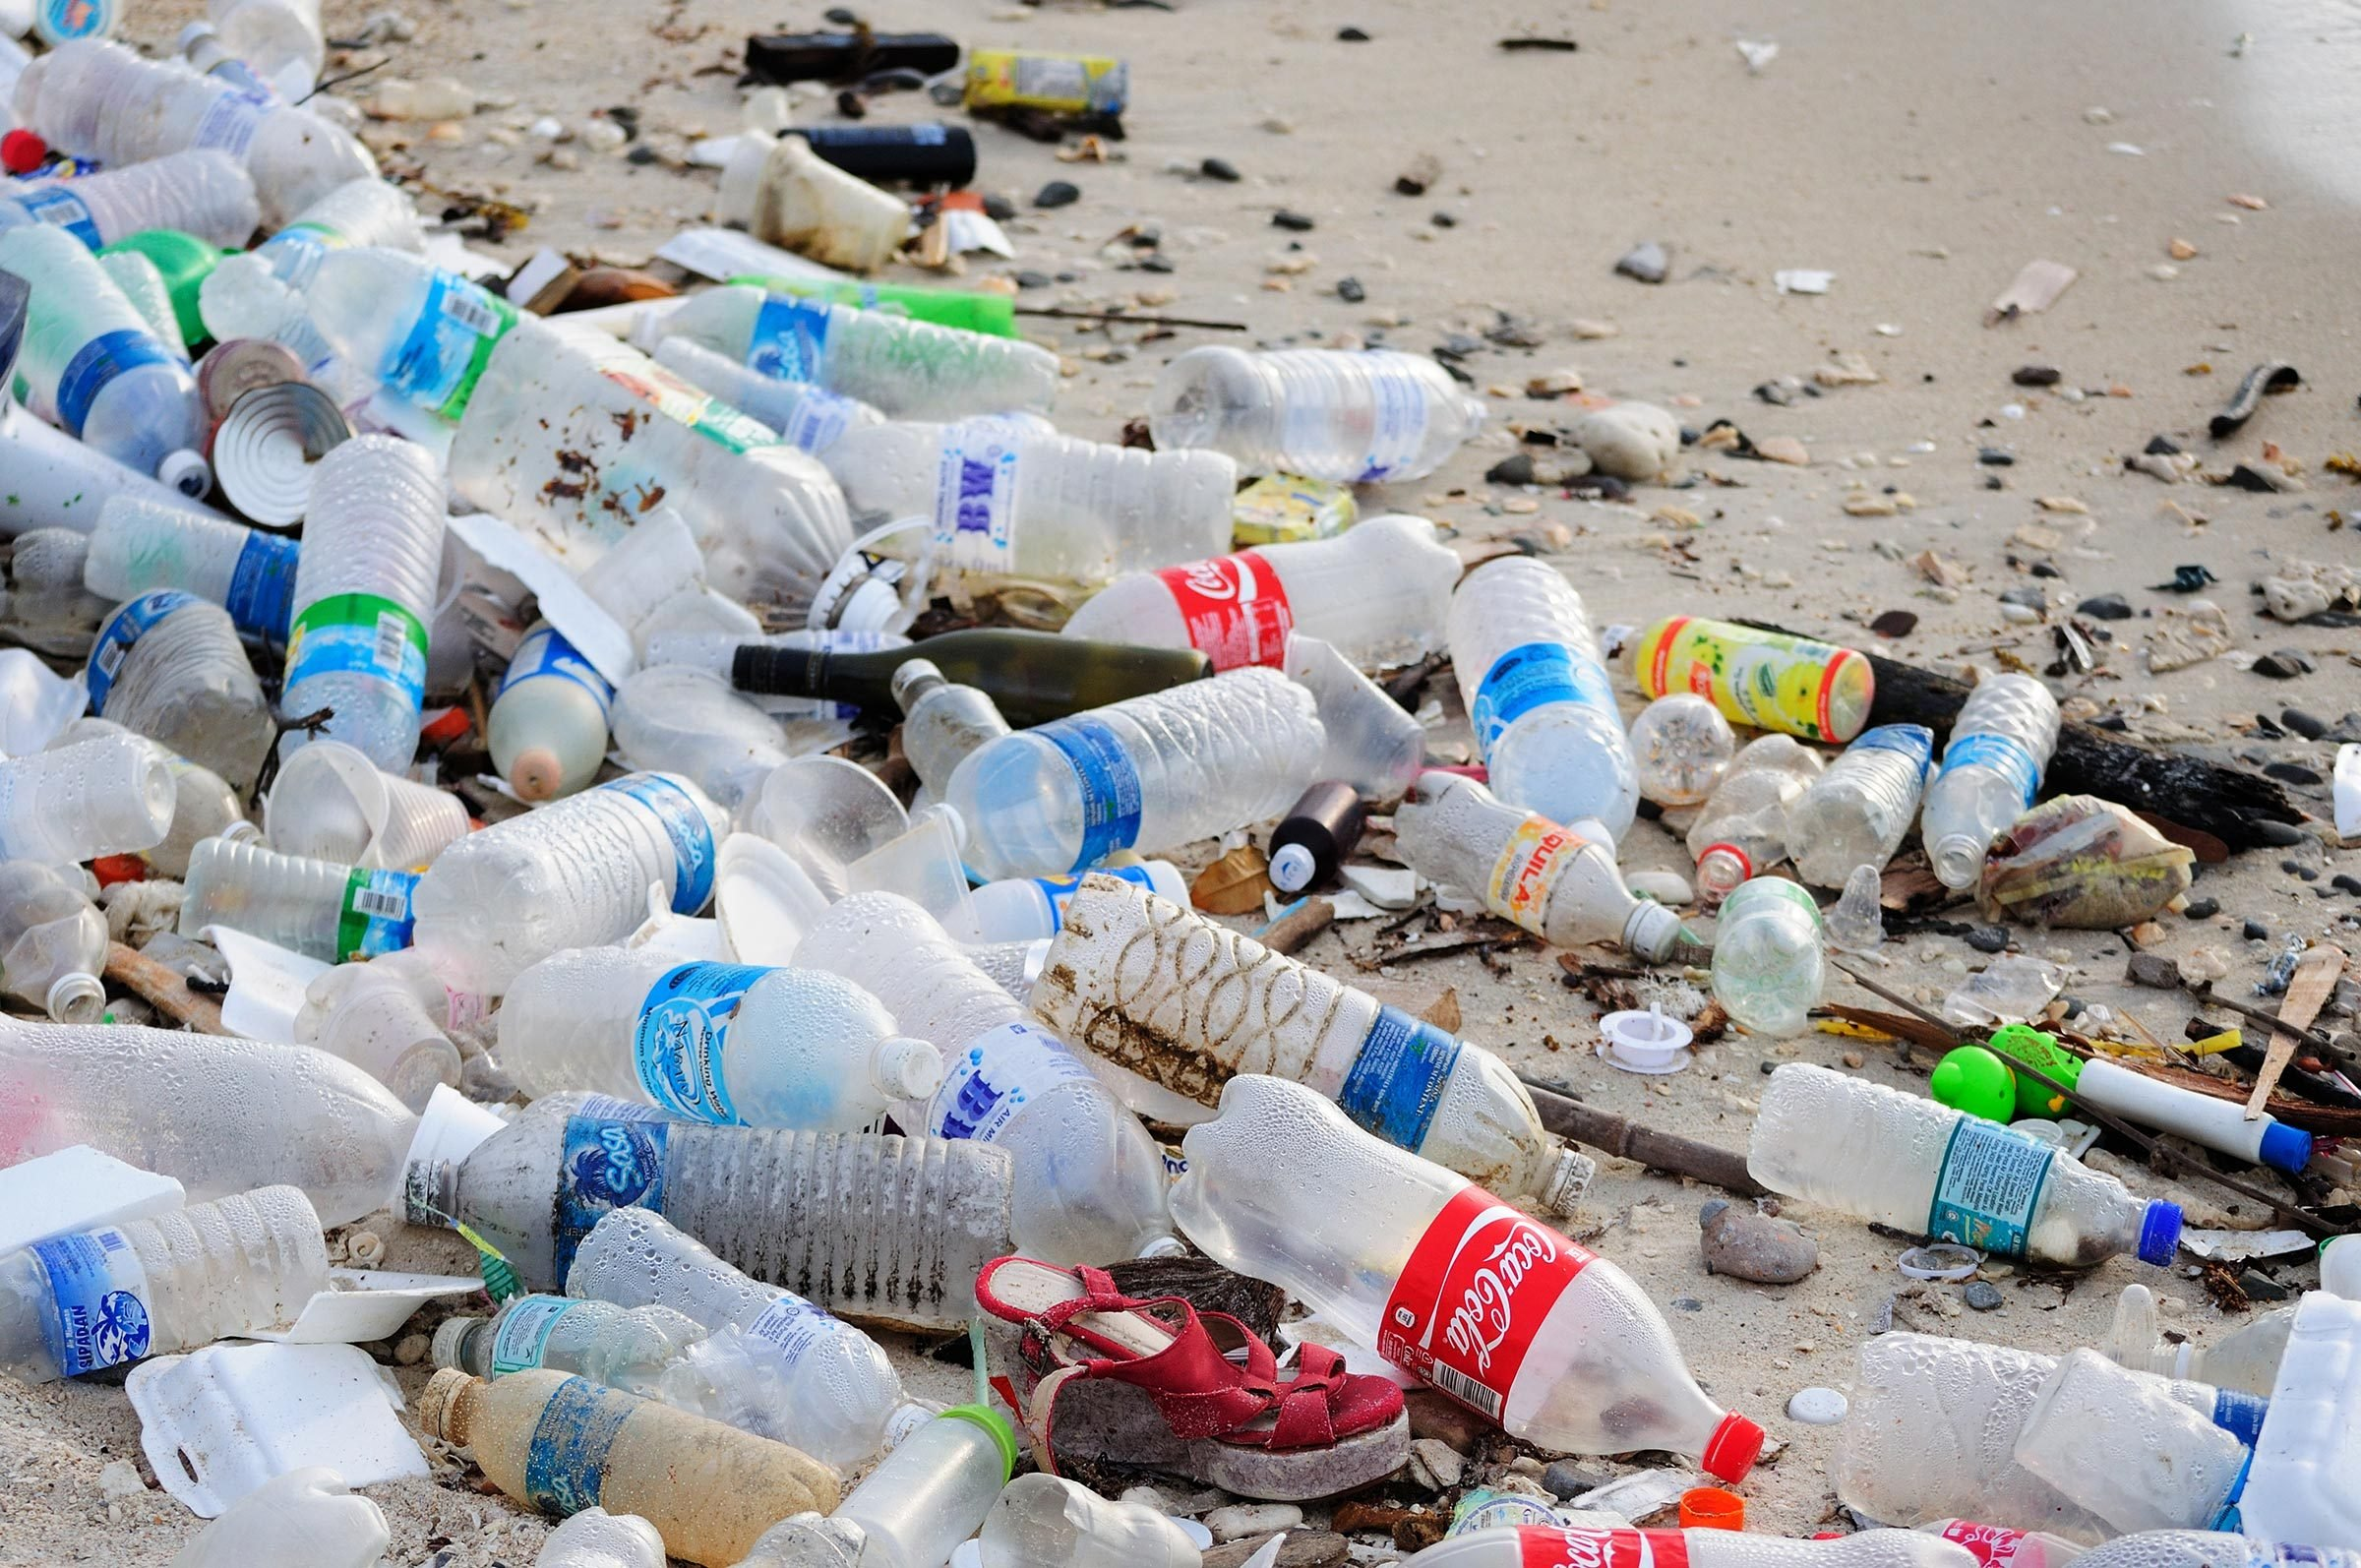 KOTA KINABALU, MALAYSIA - MARCH 13, 2016: Garbage and plastic bottles on a beach left in Kota Kinabalu beach.